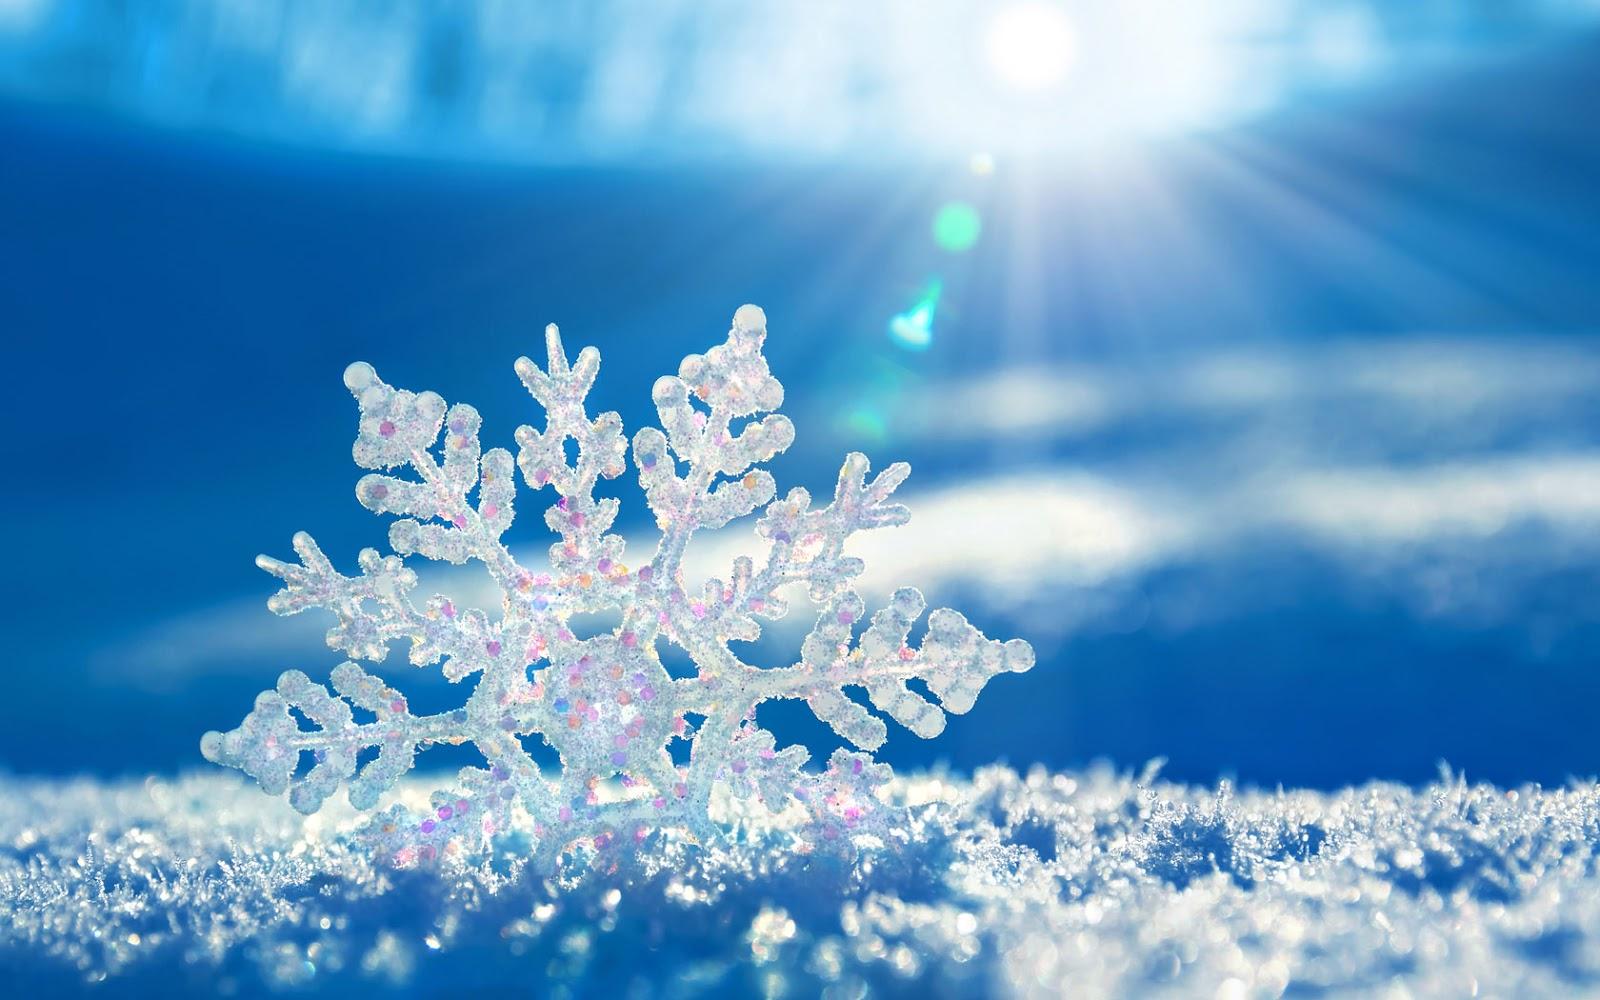 Sneeuwvlok in zon